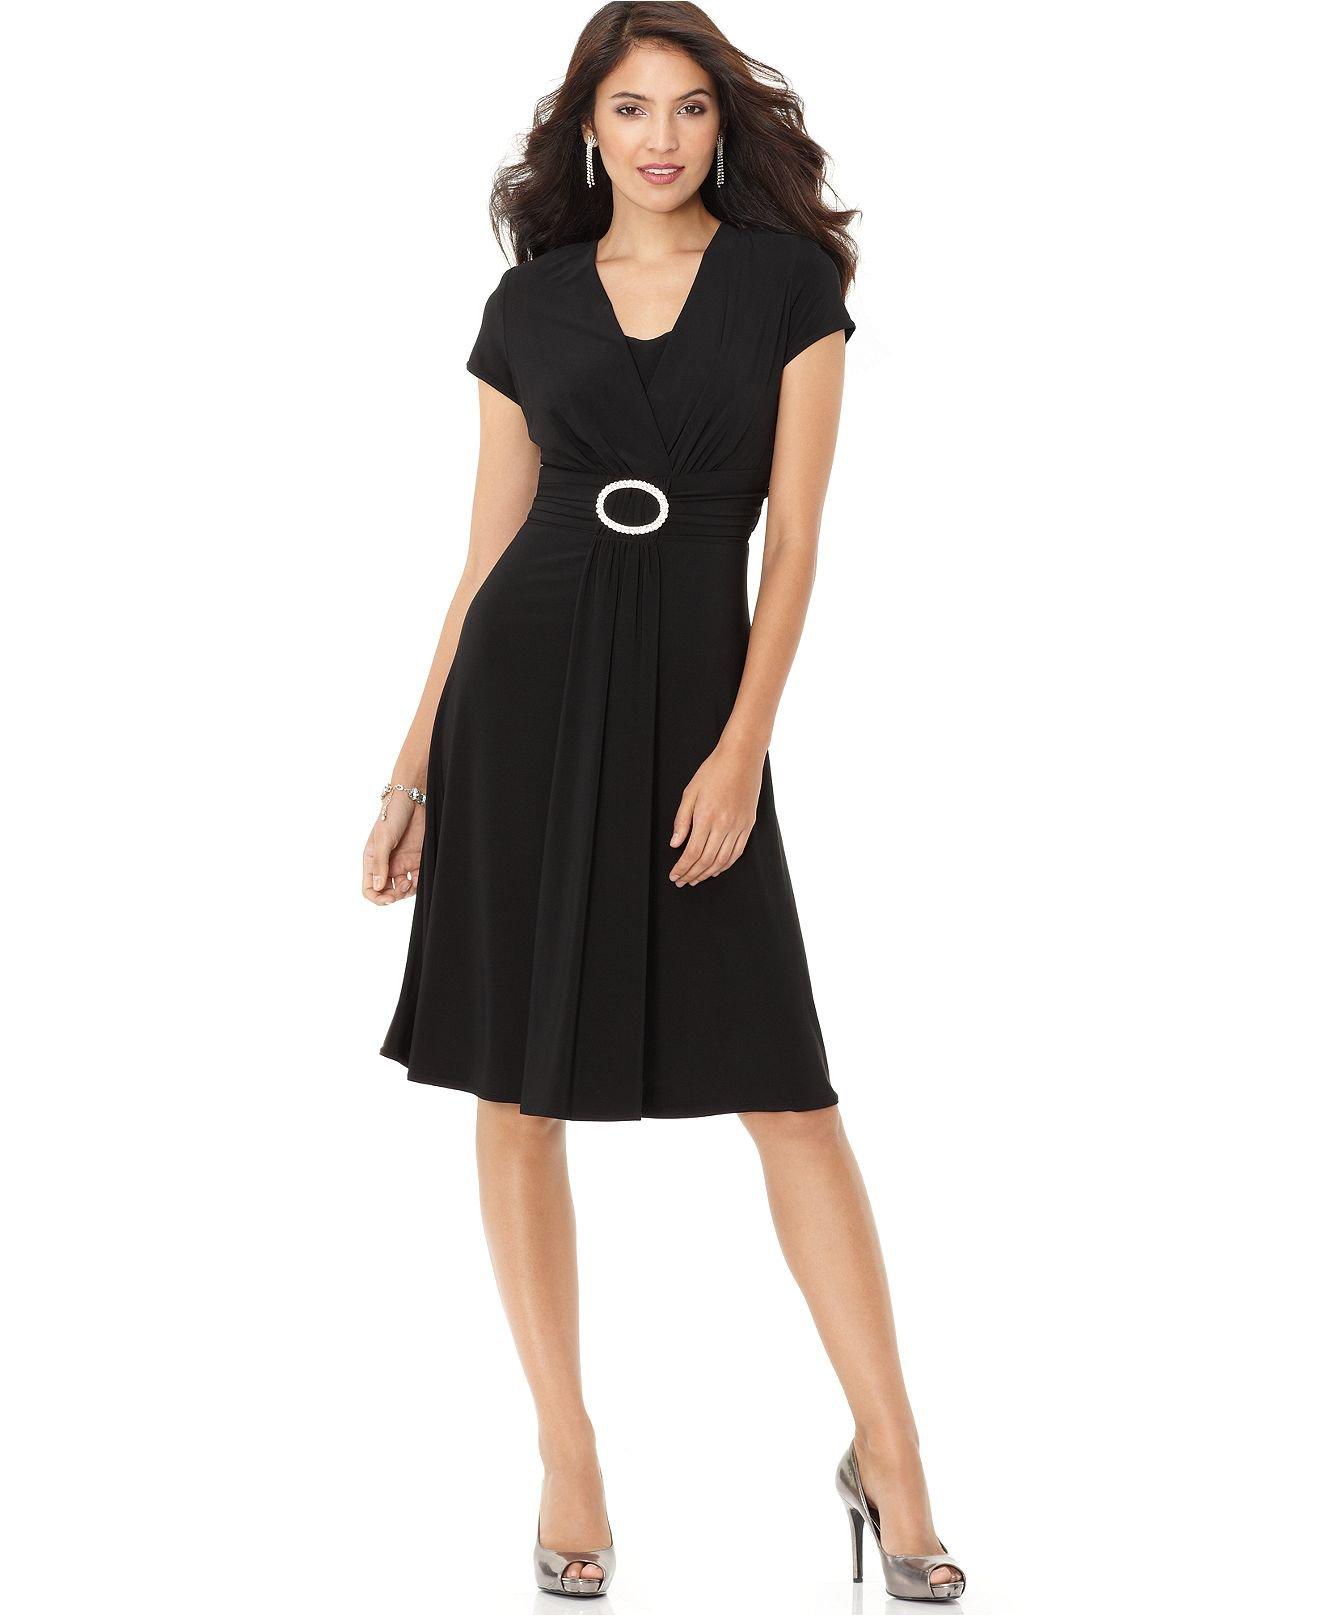 macys womens black dresses photo - 1